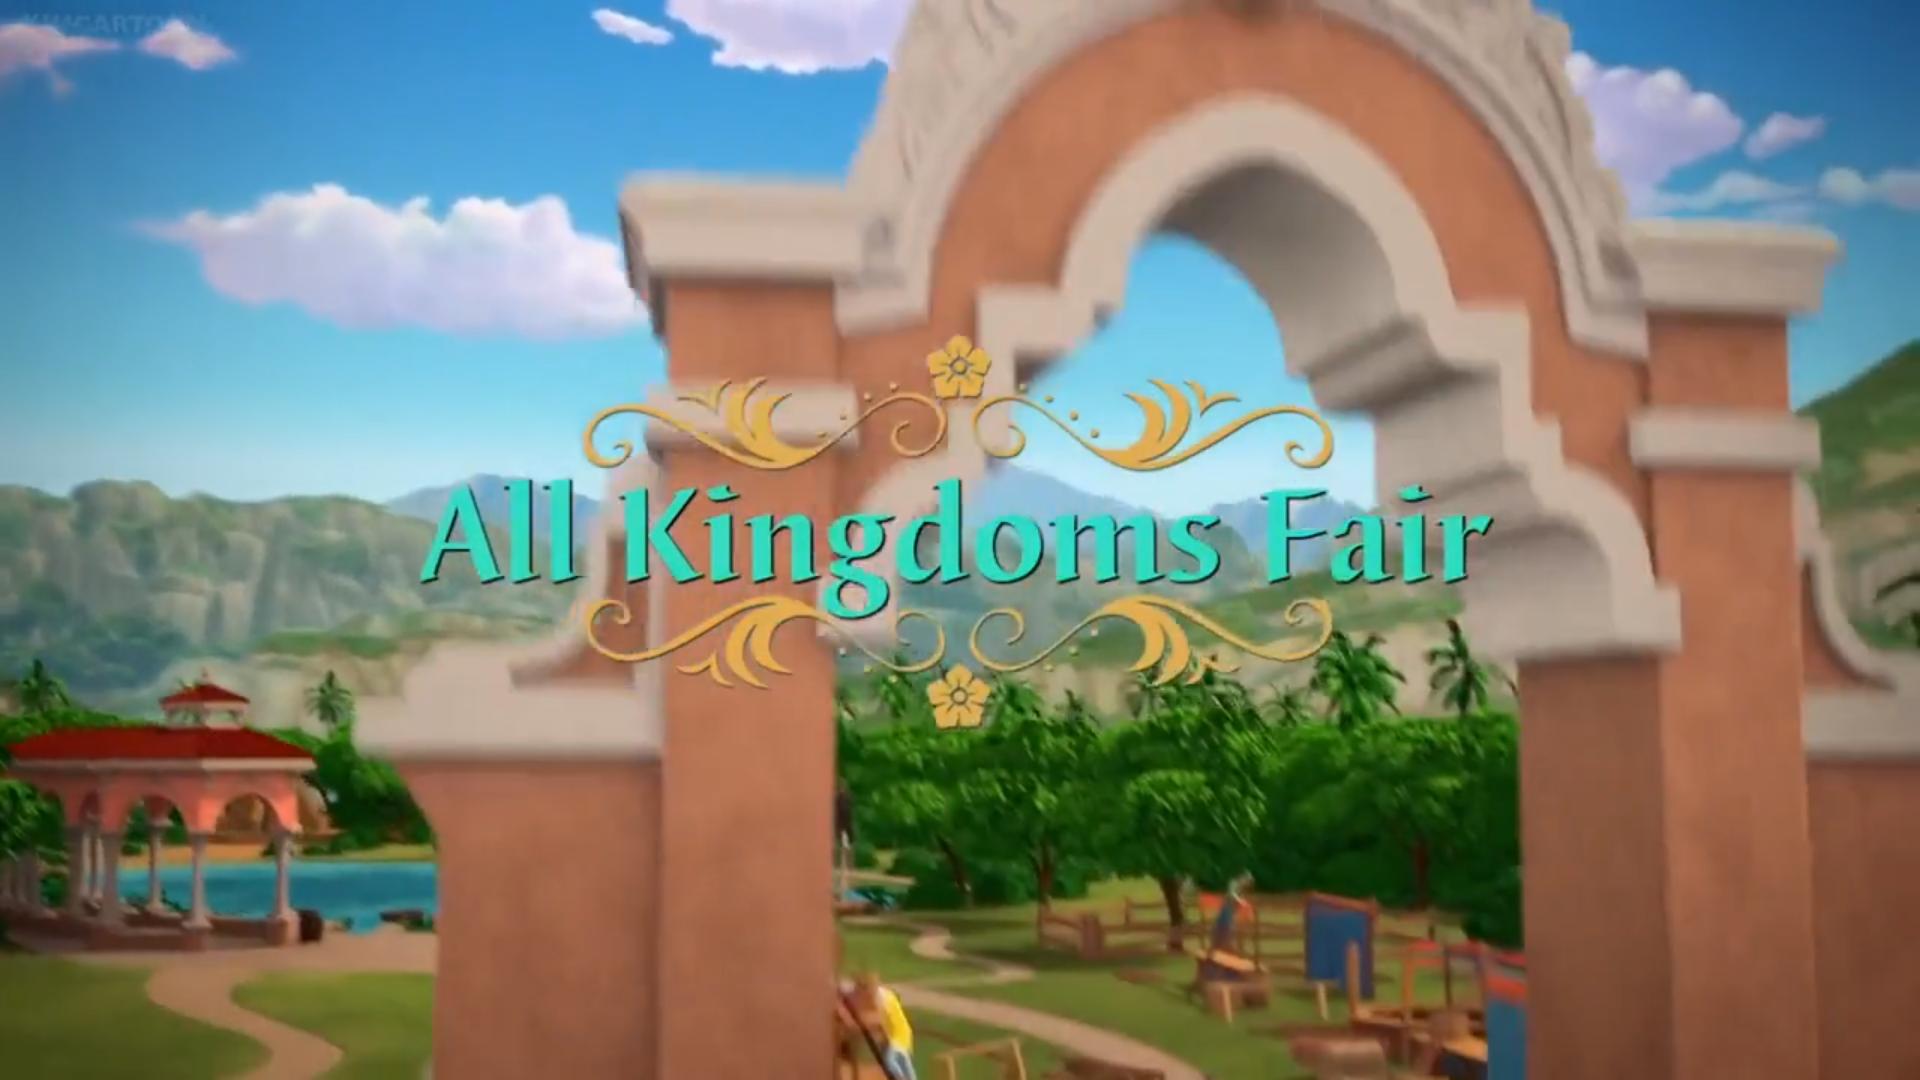 A Feira de Todos os Reinos